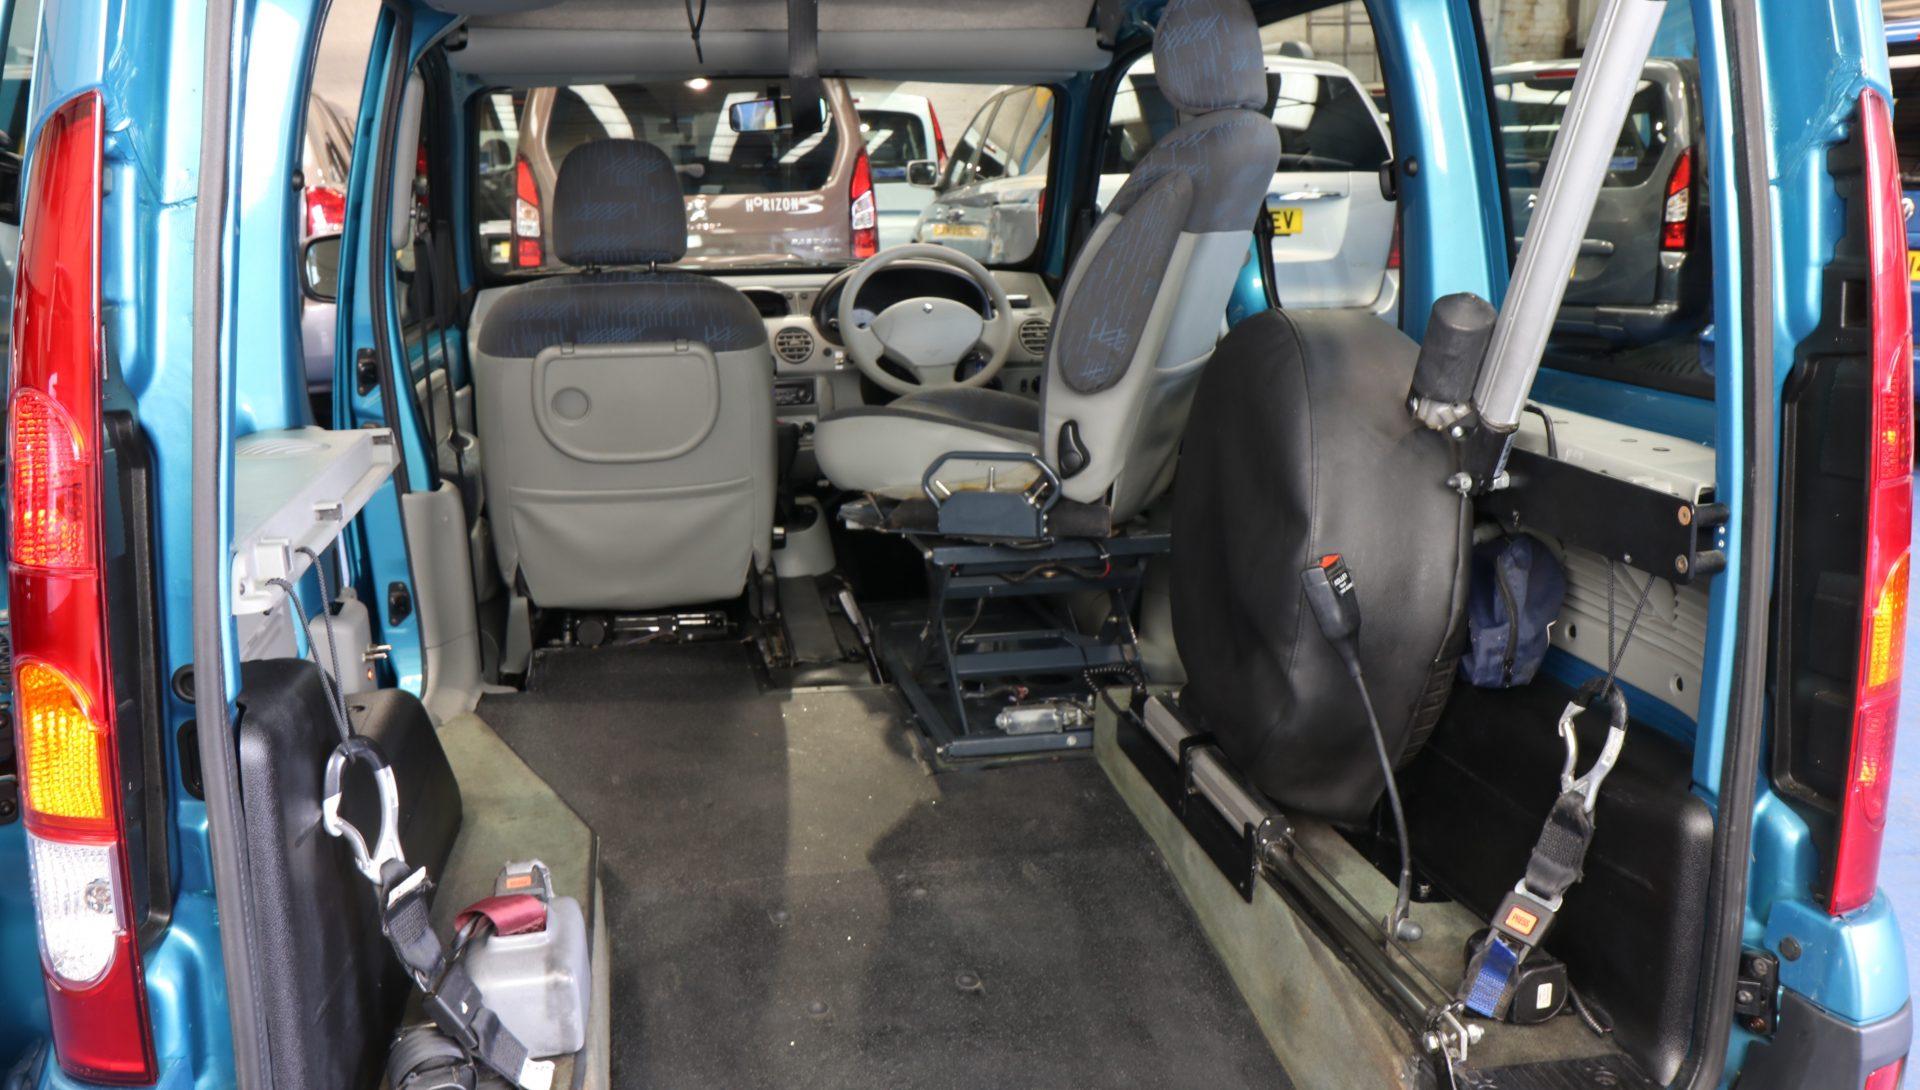 Kangoo Transfer vehicle pn08 bav